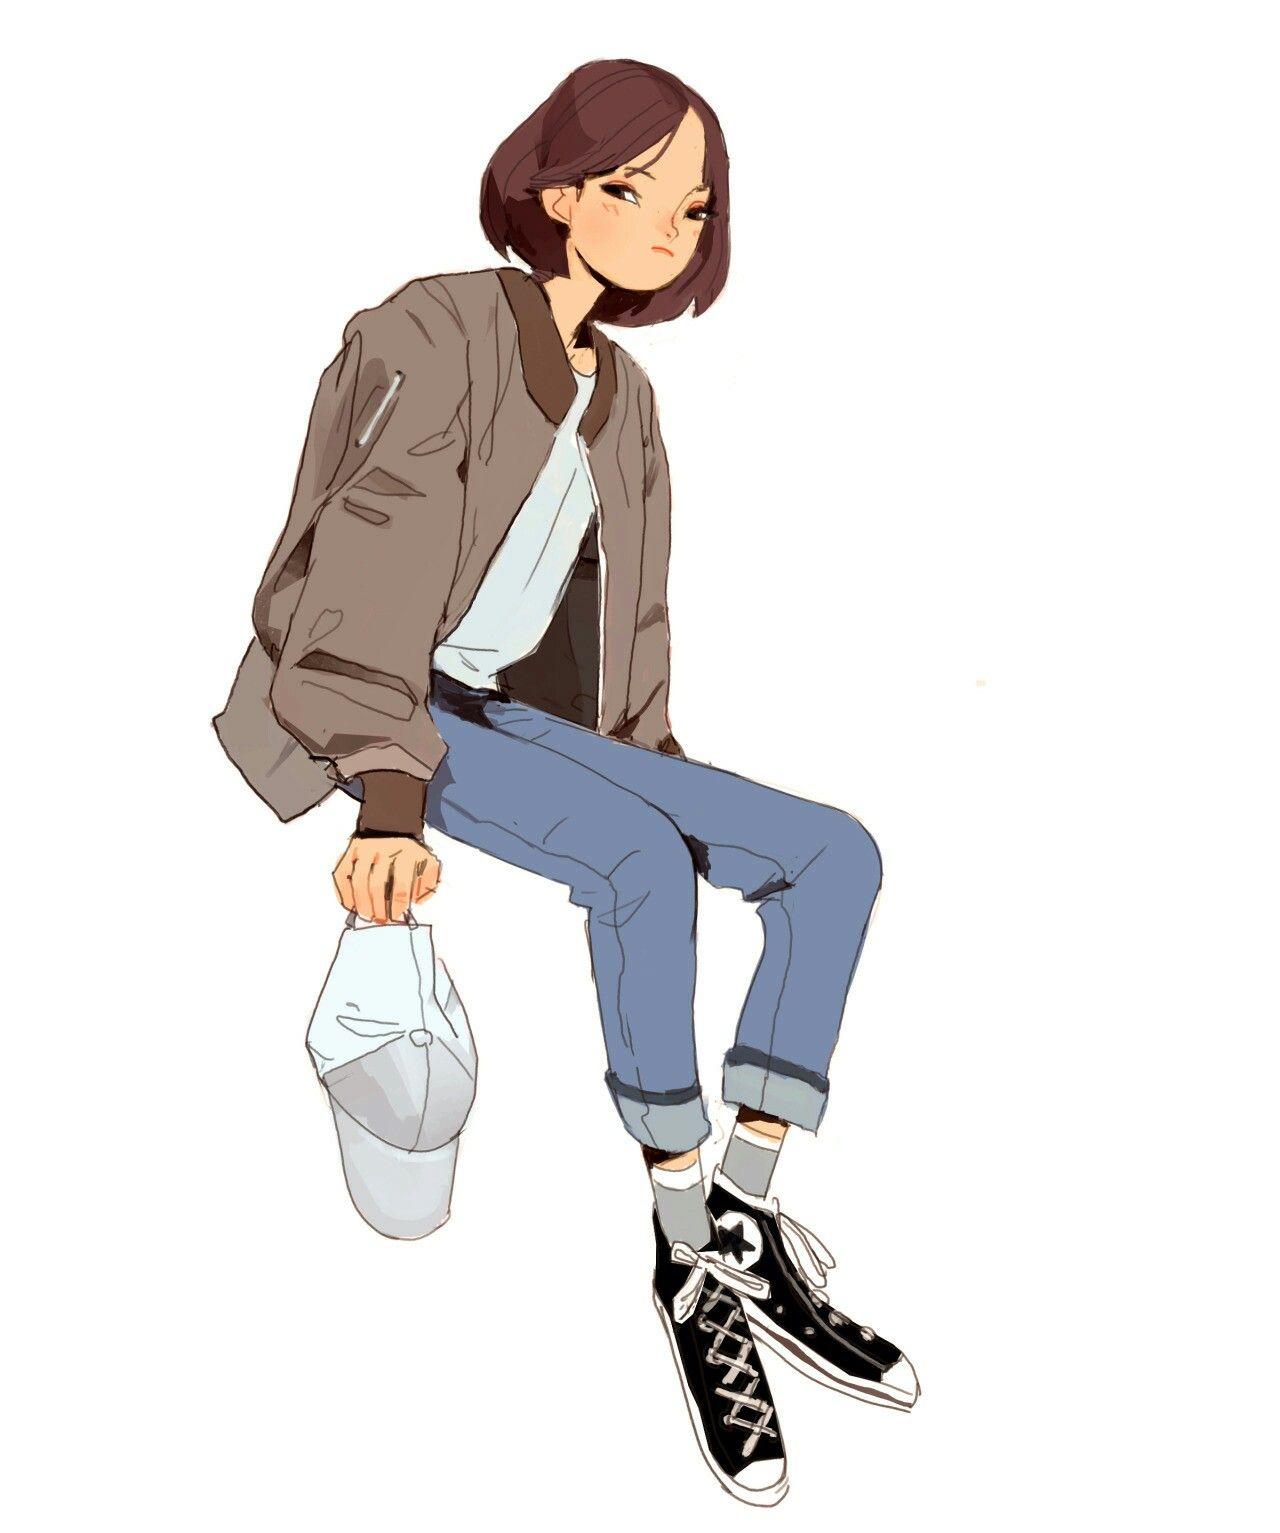 Bomber character design character design inspiration